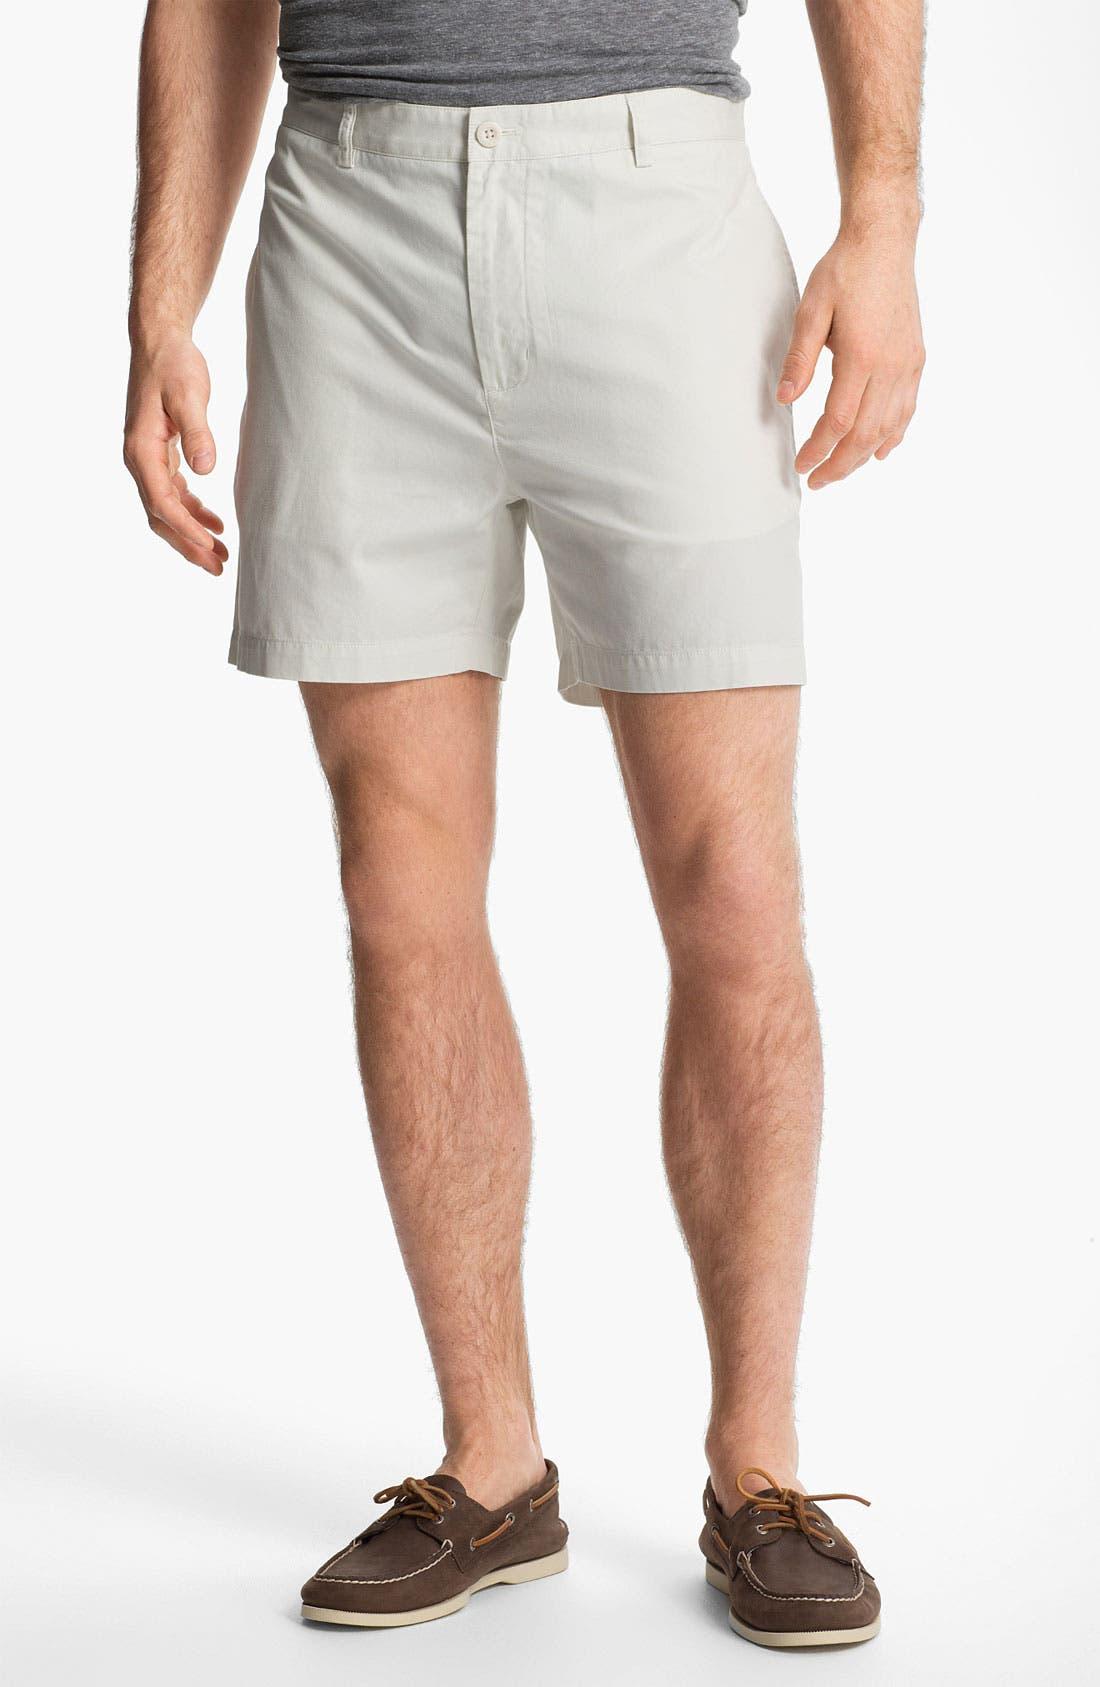 Main Image - Vineyard Vines 'Summer Club' Twill Shorts